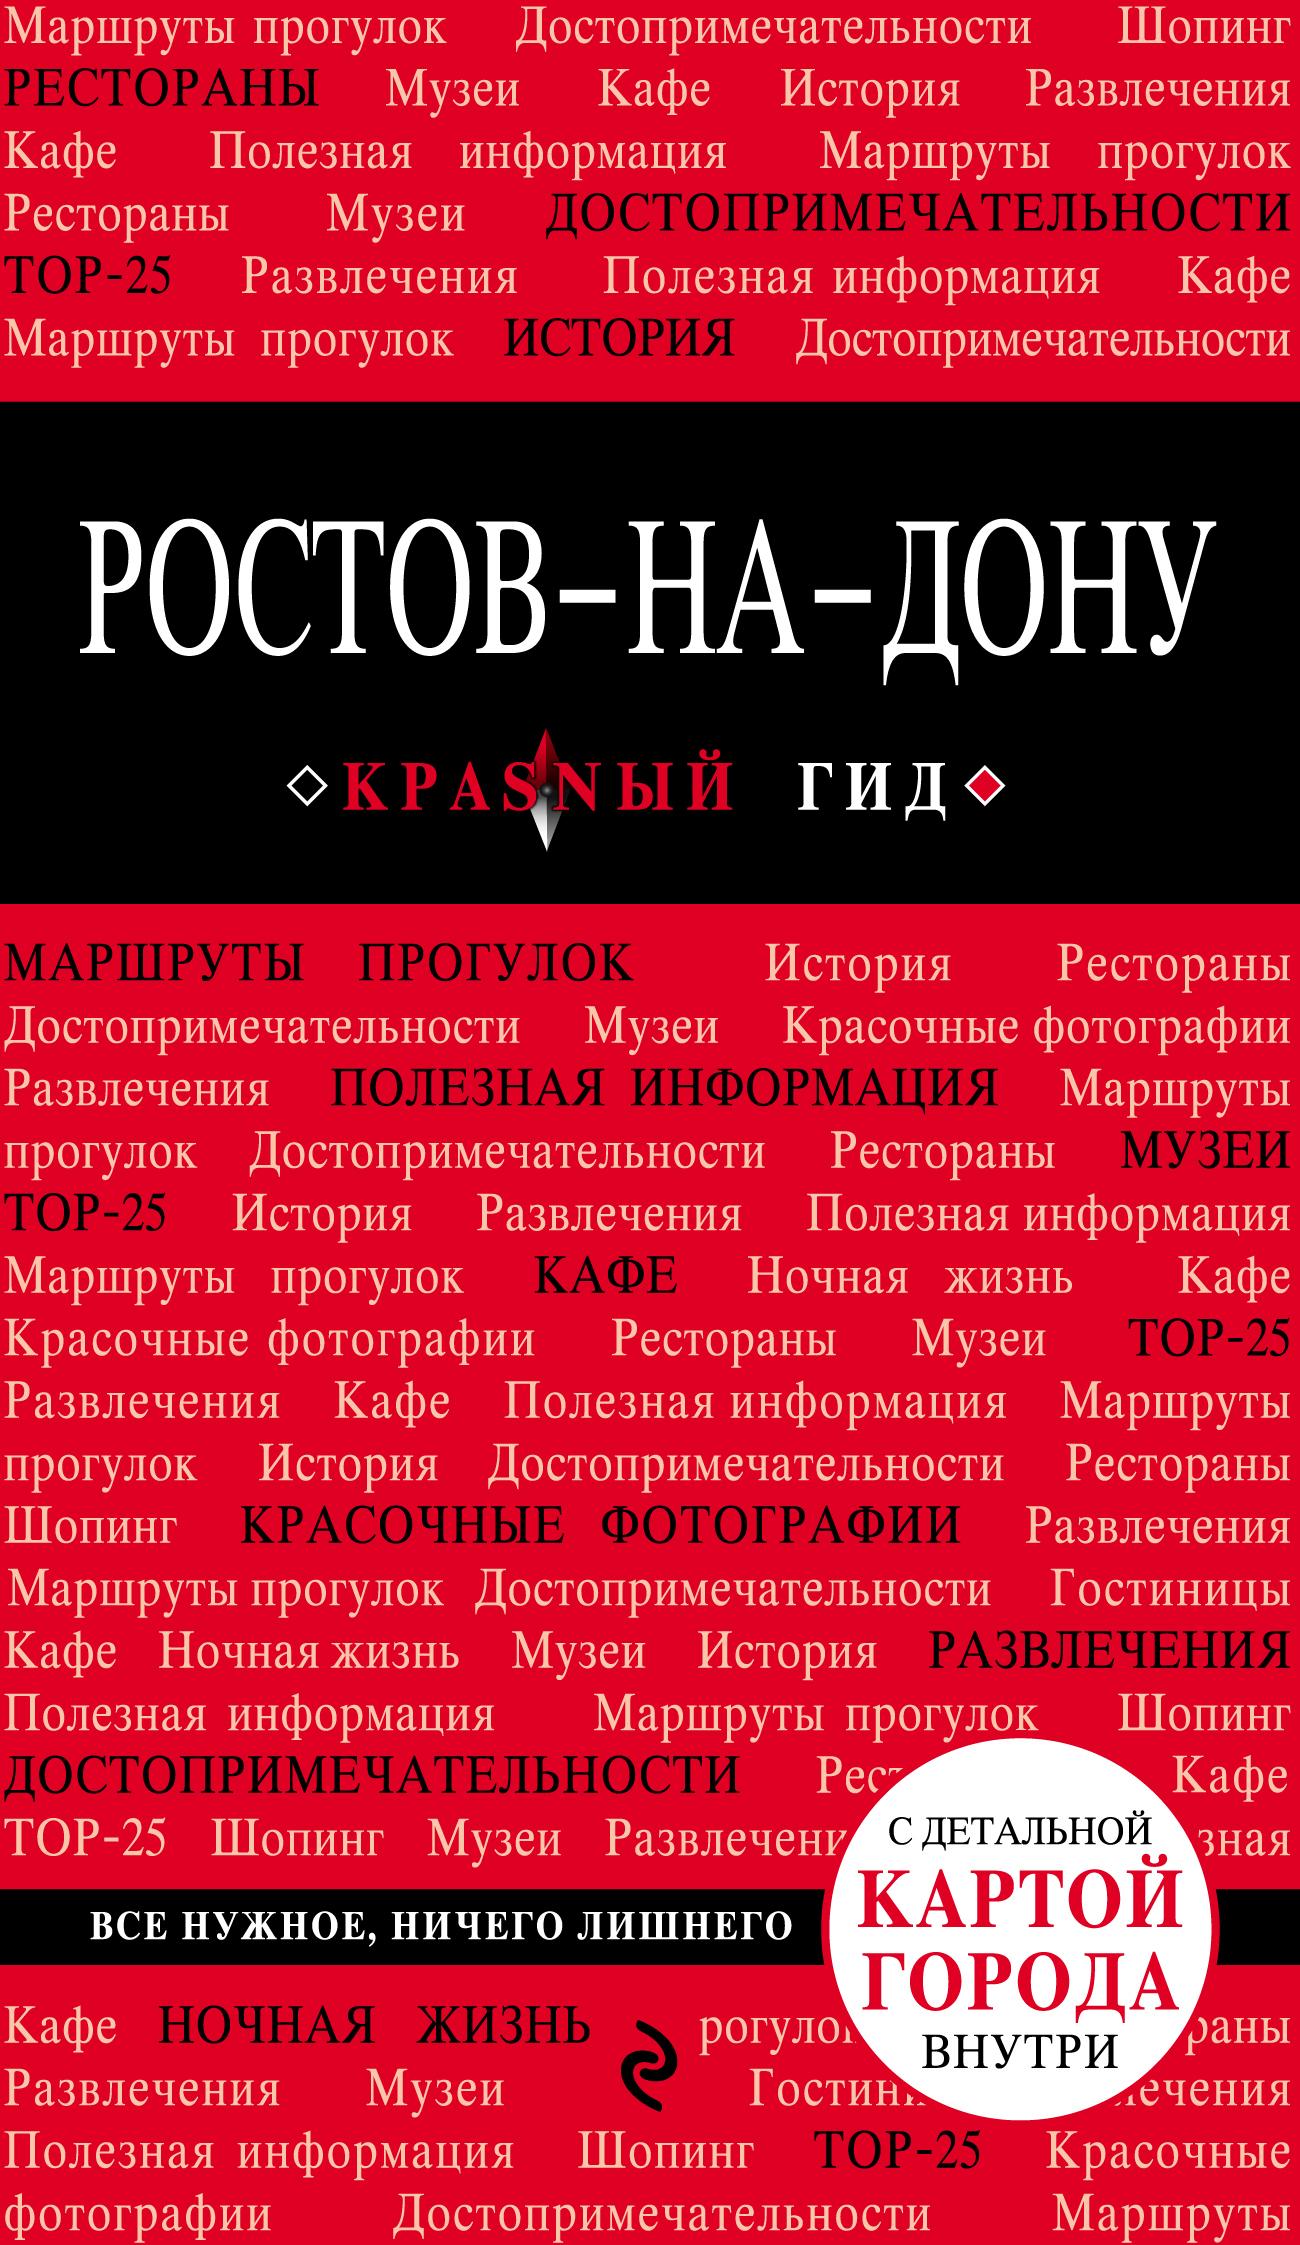 А. А. Феоктистова Ростов-на-Дону. Путеводитель муравьи ростов на дону